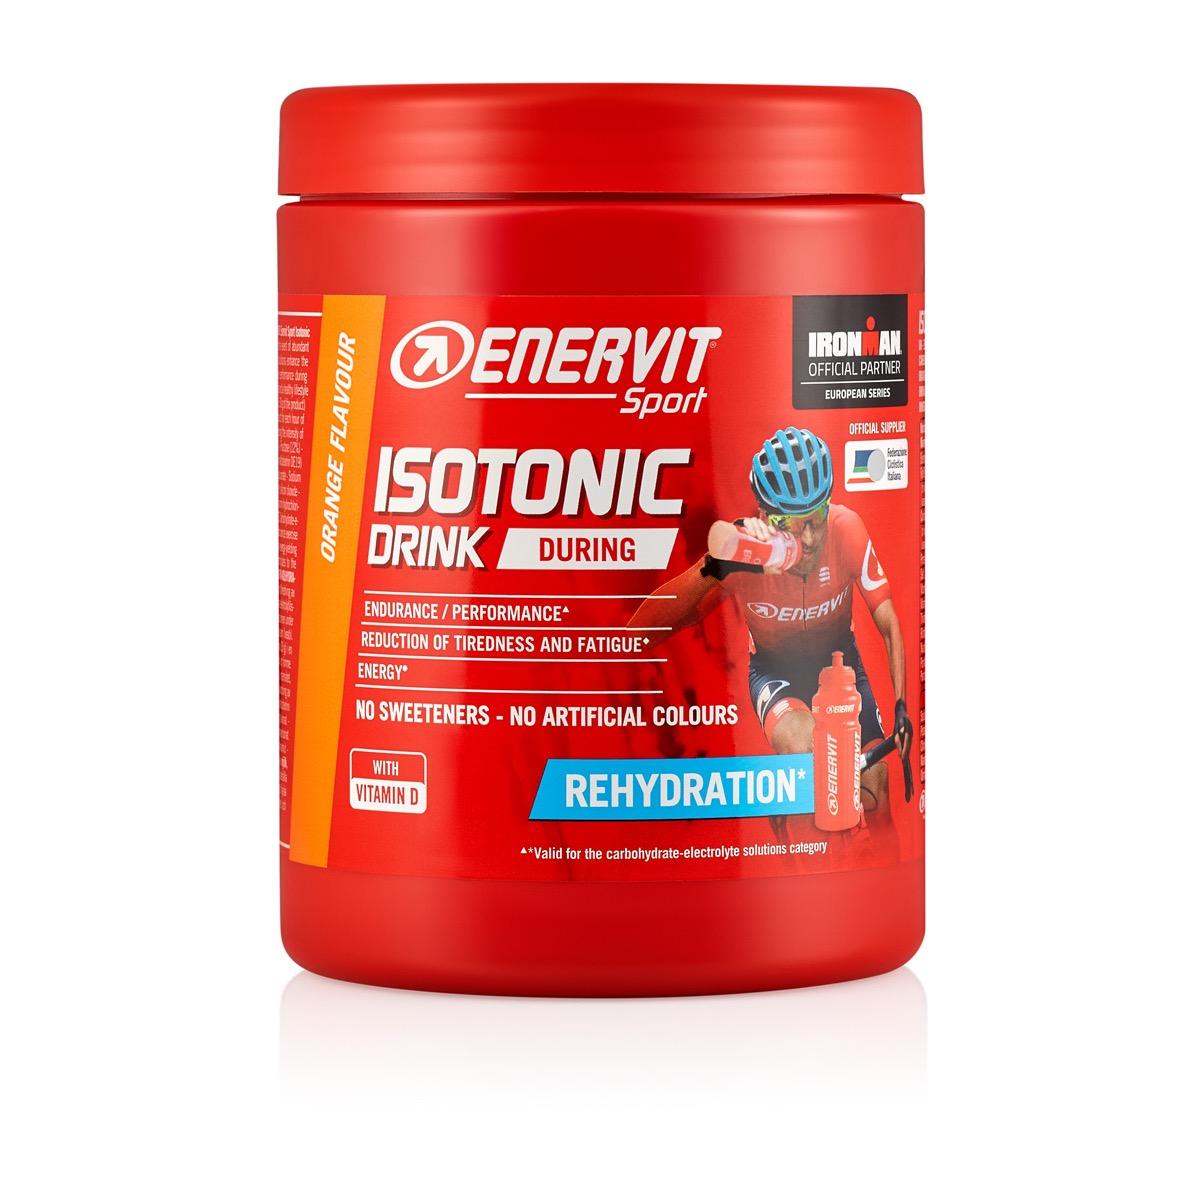 Isotonic Drink Orange 10 12 2019 Fotor